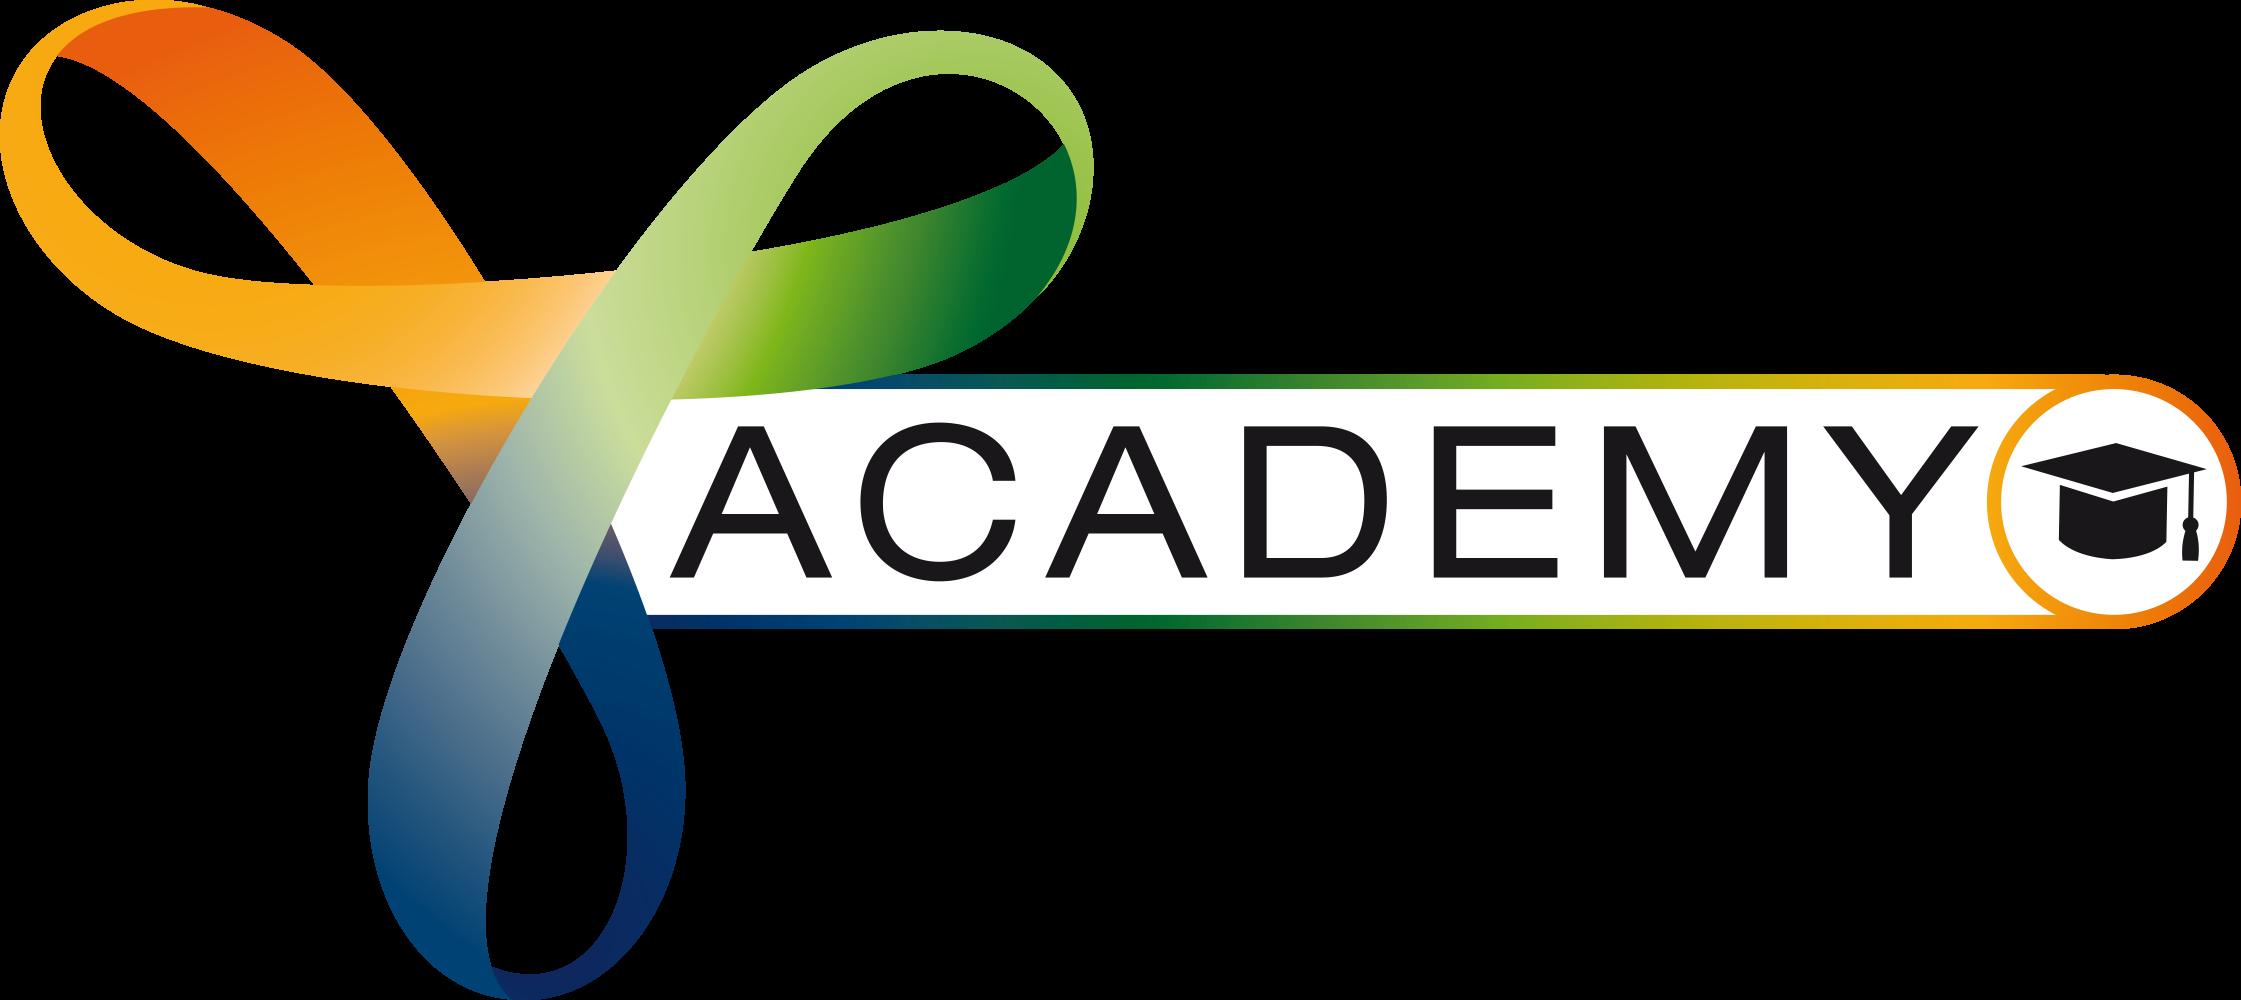 YAKINDU Academy Logo